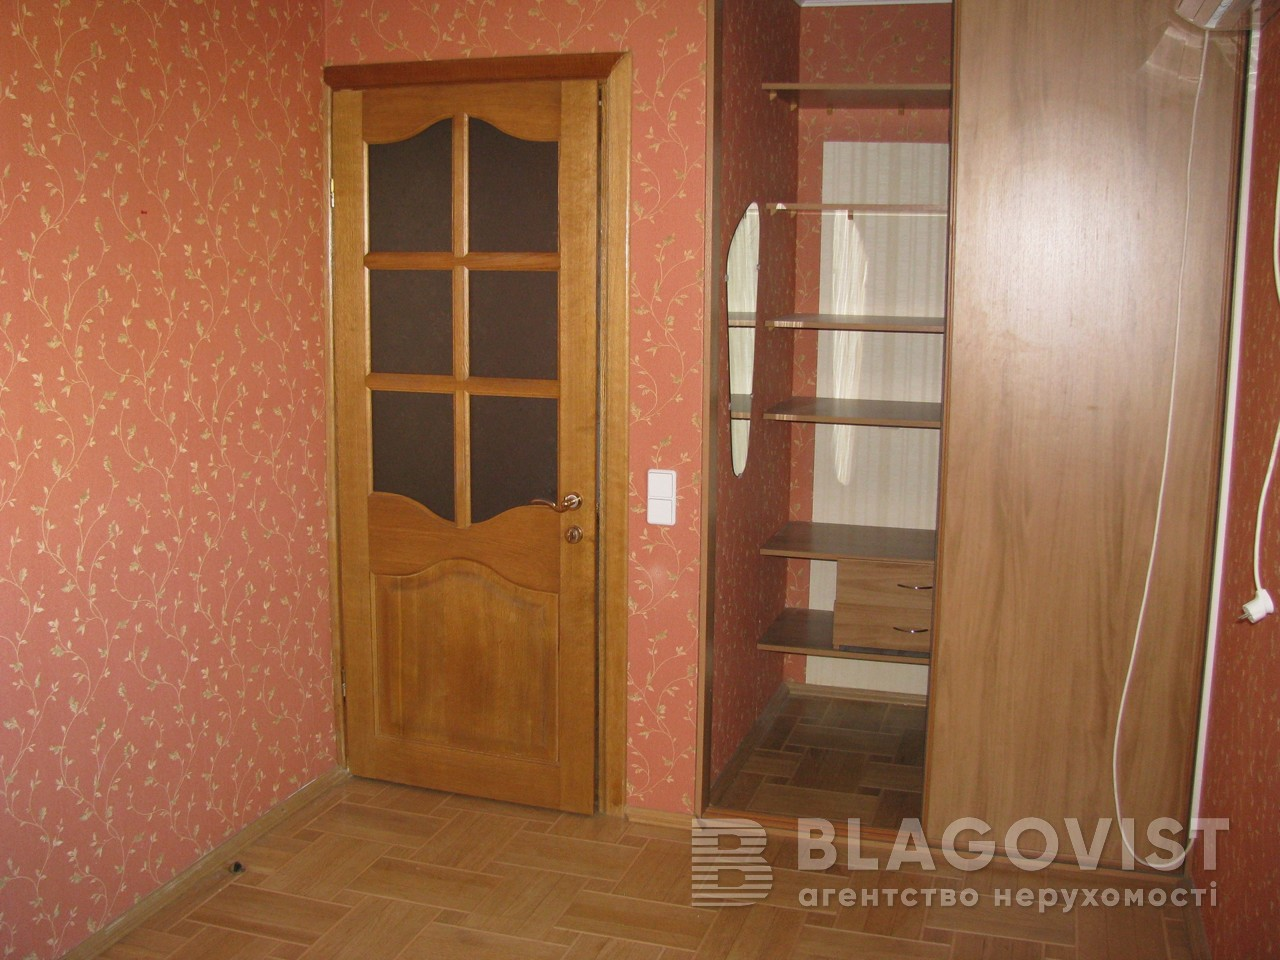 Квартира H-35926, Богатырская, 6/1, Киев - Фото 6